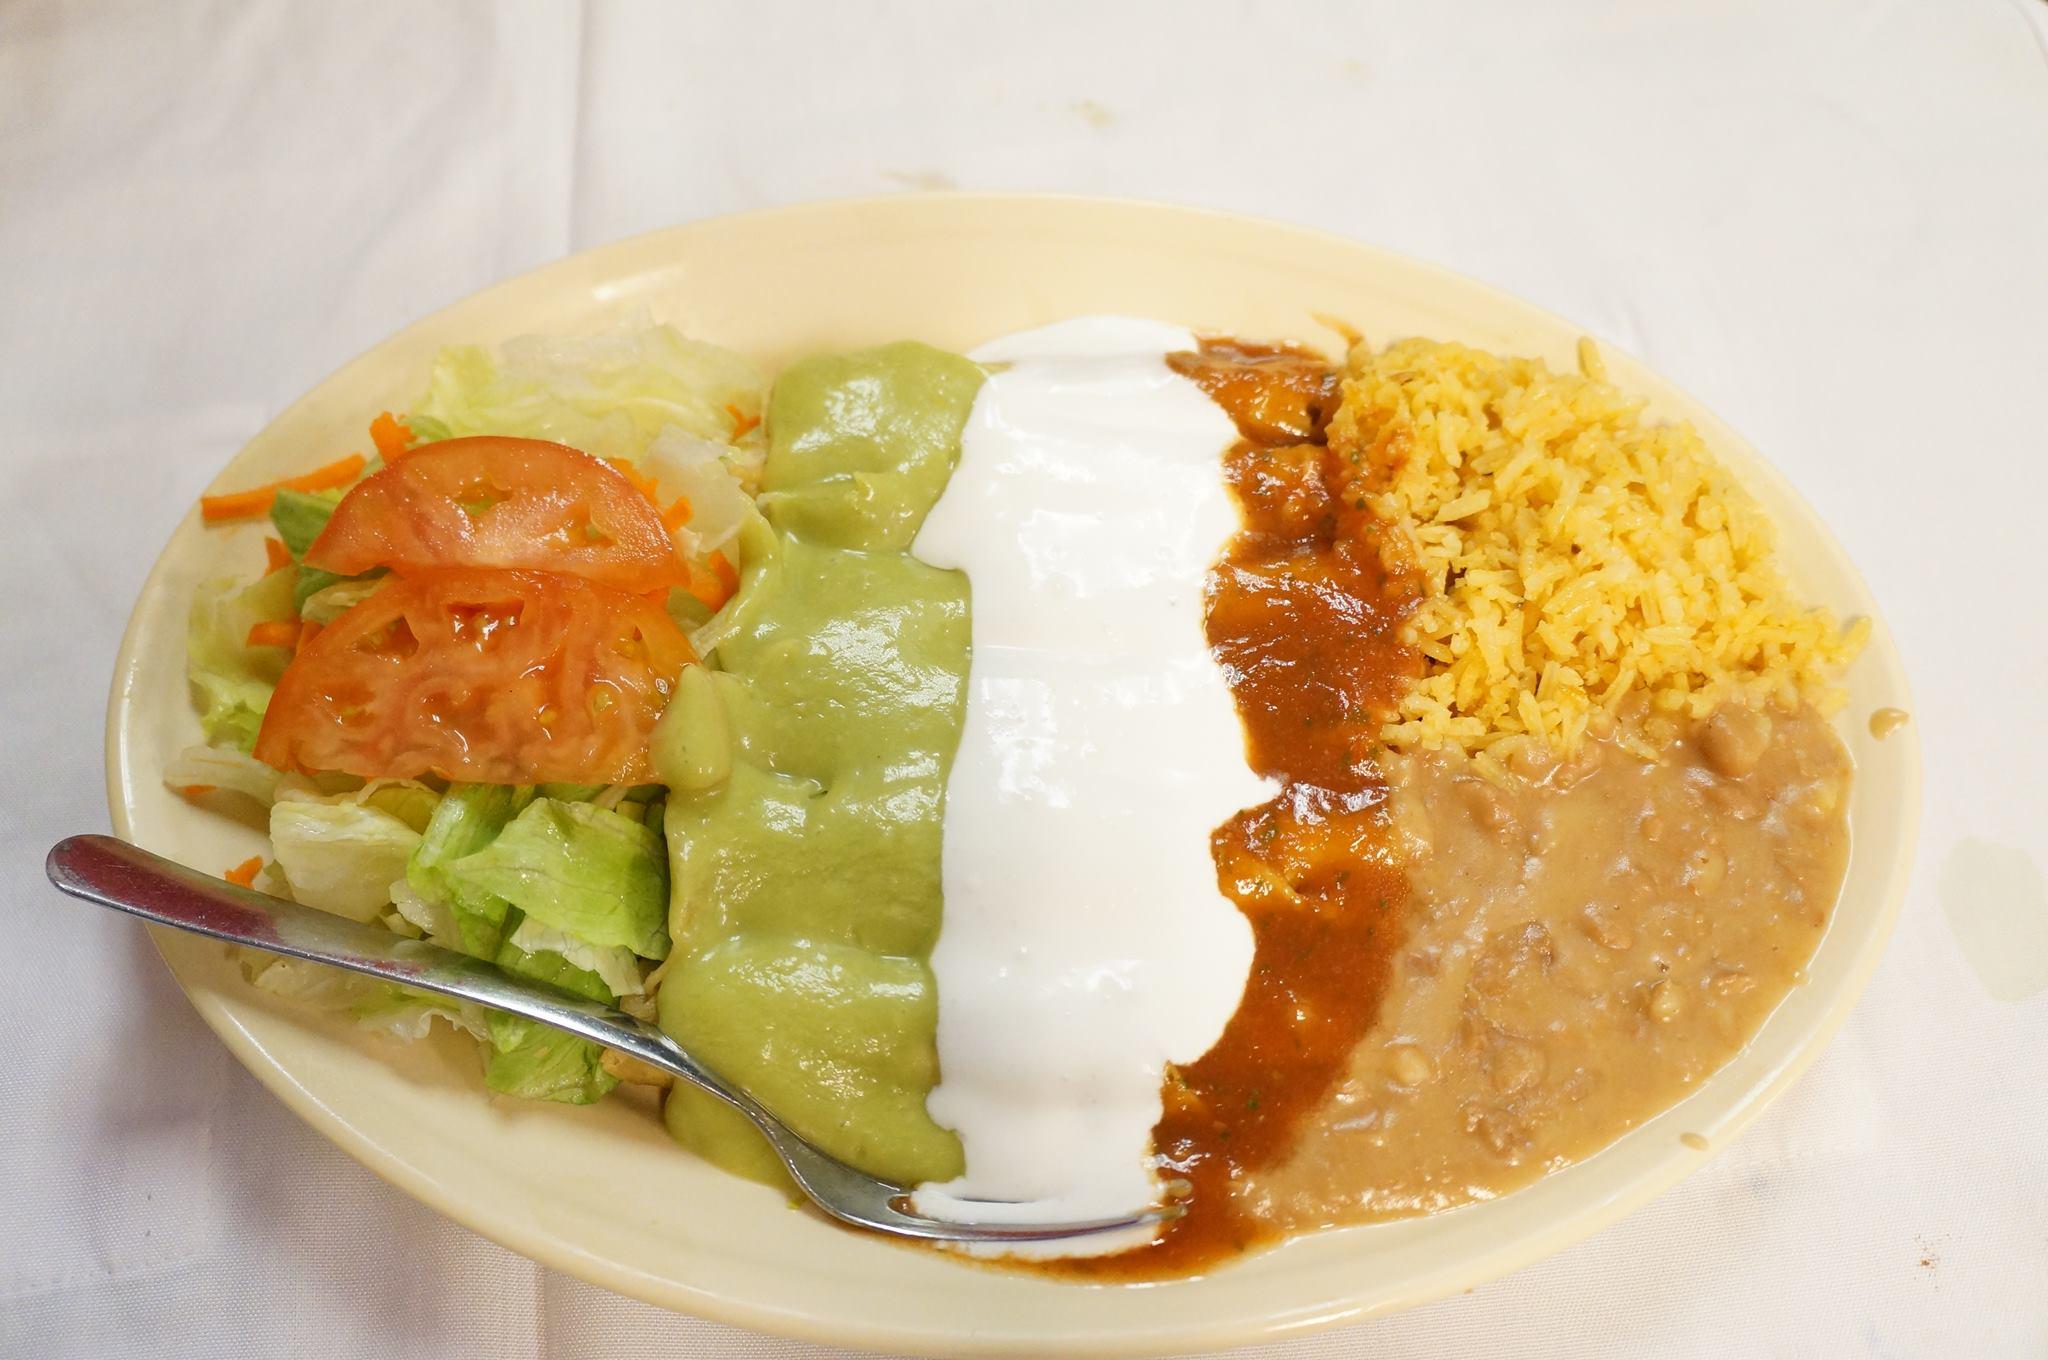 Taqueria La Pila 8714 Alameda Ave, El Paso